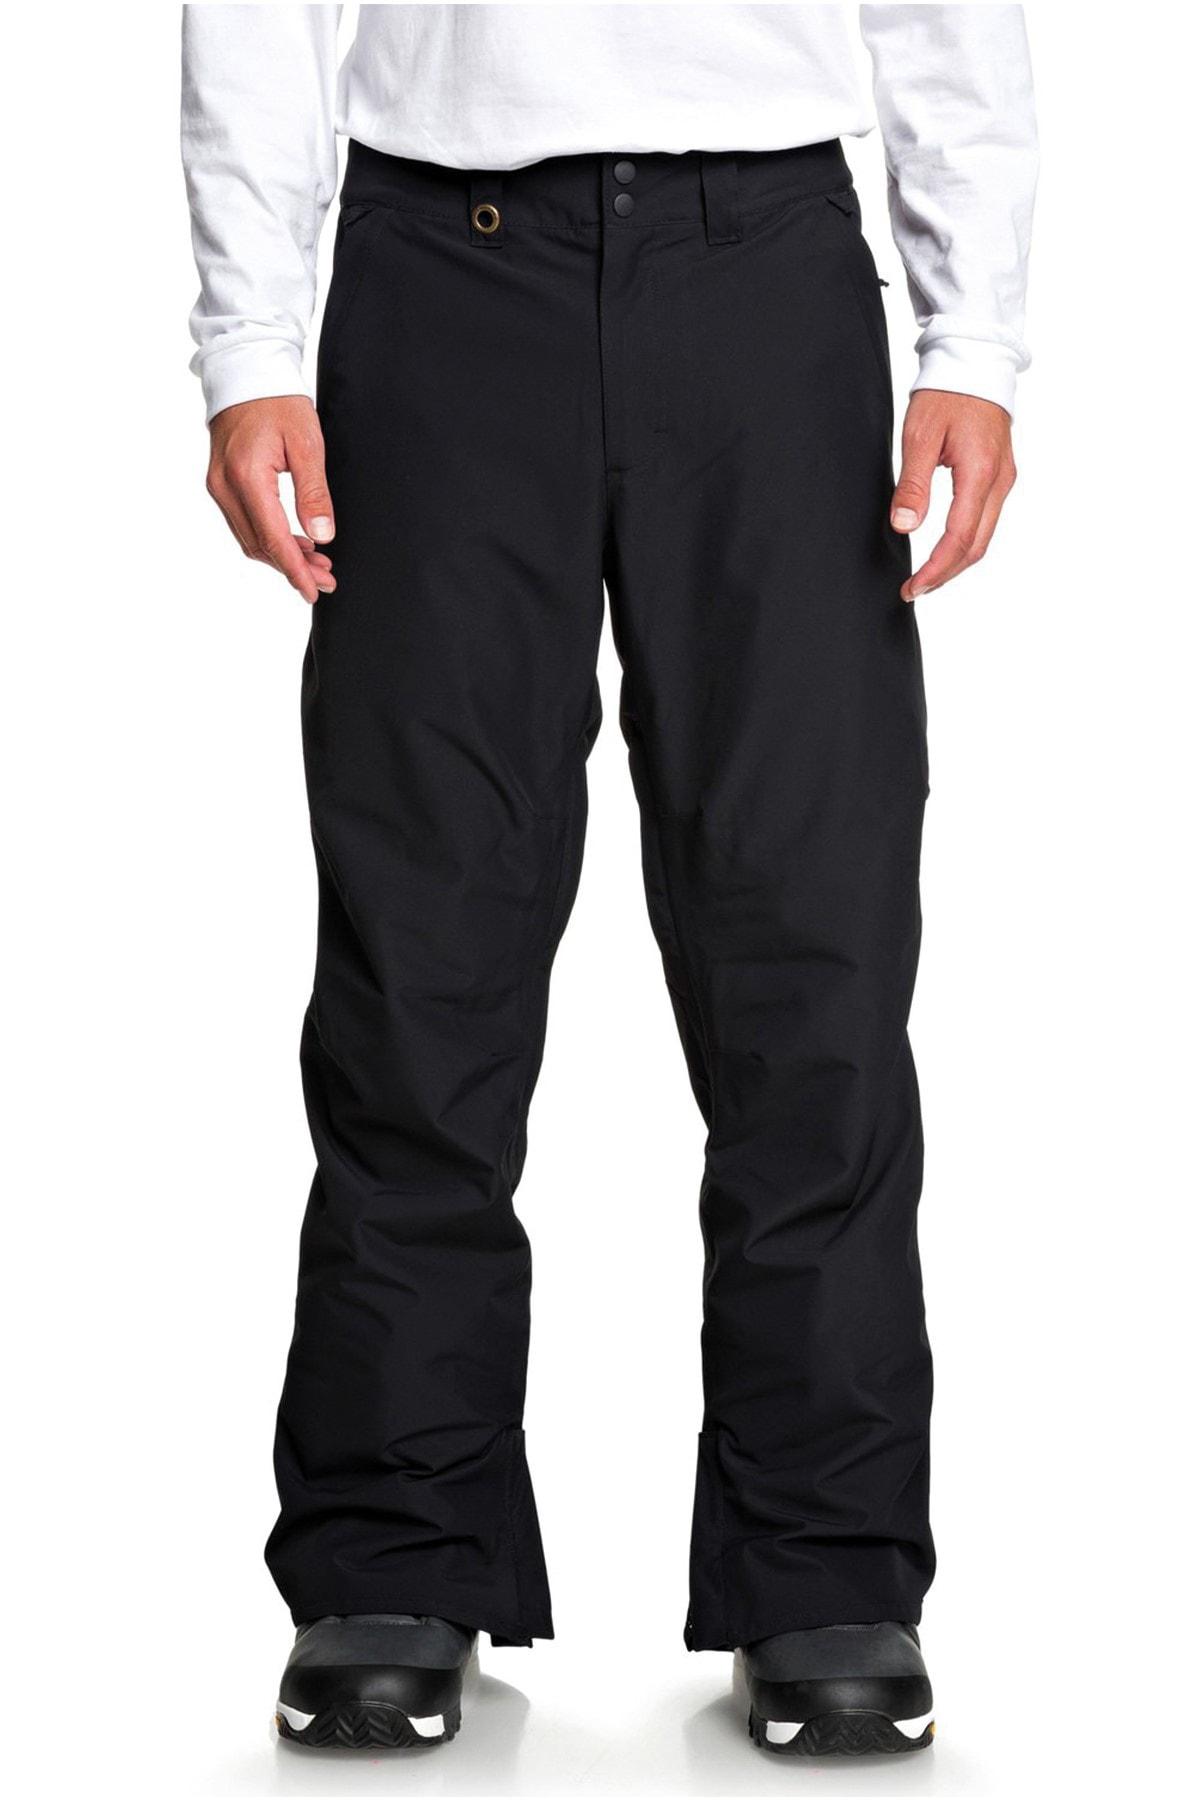 Quiksilver Estate PT SNPT Erkek Kayak Pantolonu EQYTP03116-KVJ0 1